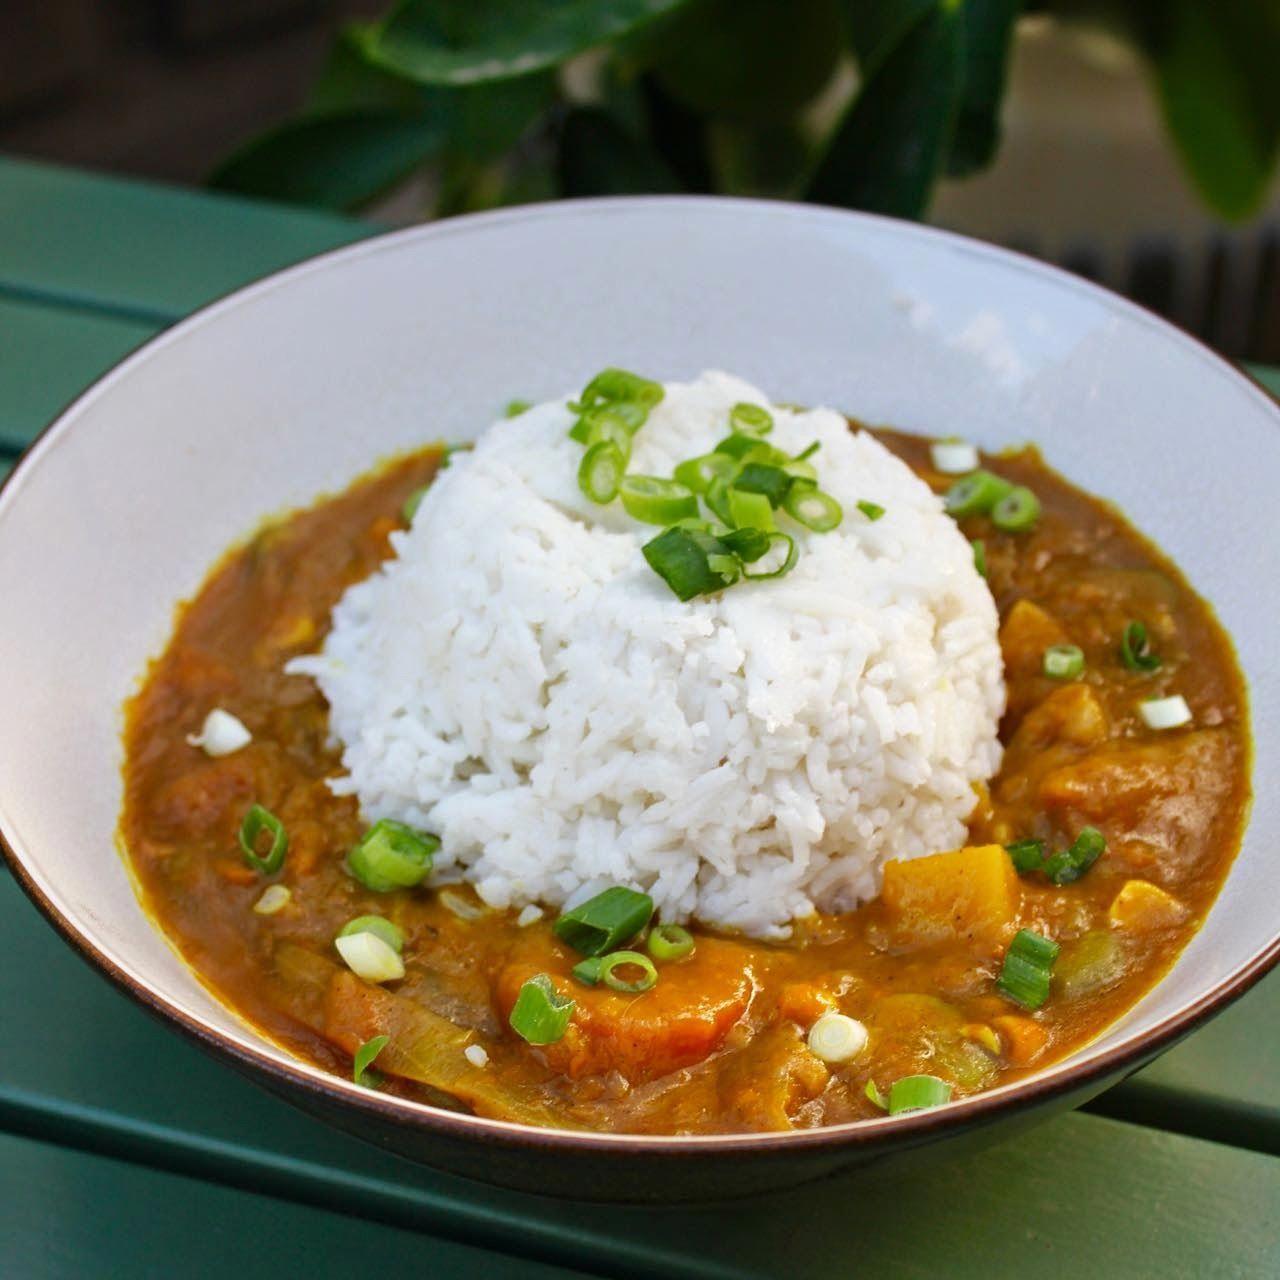 Green Gourmet Giraffe Vegetarian Japanese Curry Japanesedishes Japanese Vegetarian Recipes Vegetarian Japanese Curry Recipes Vegetarian